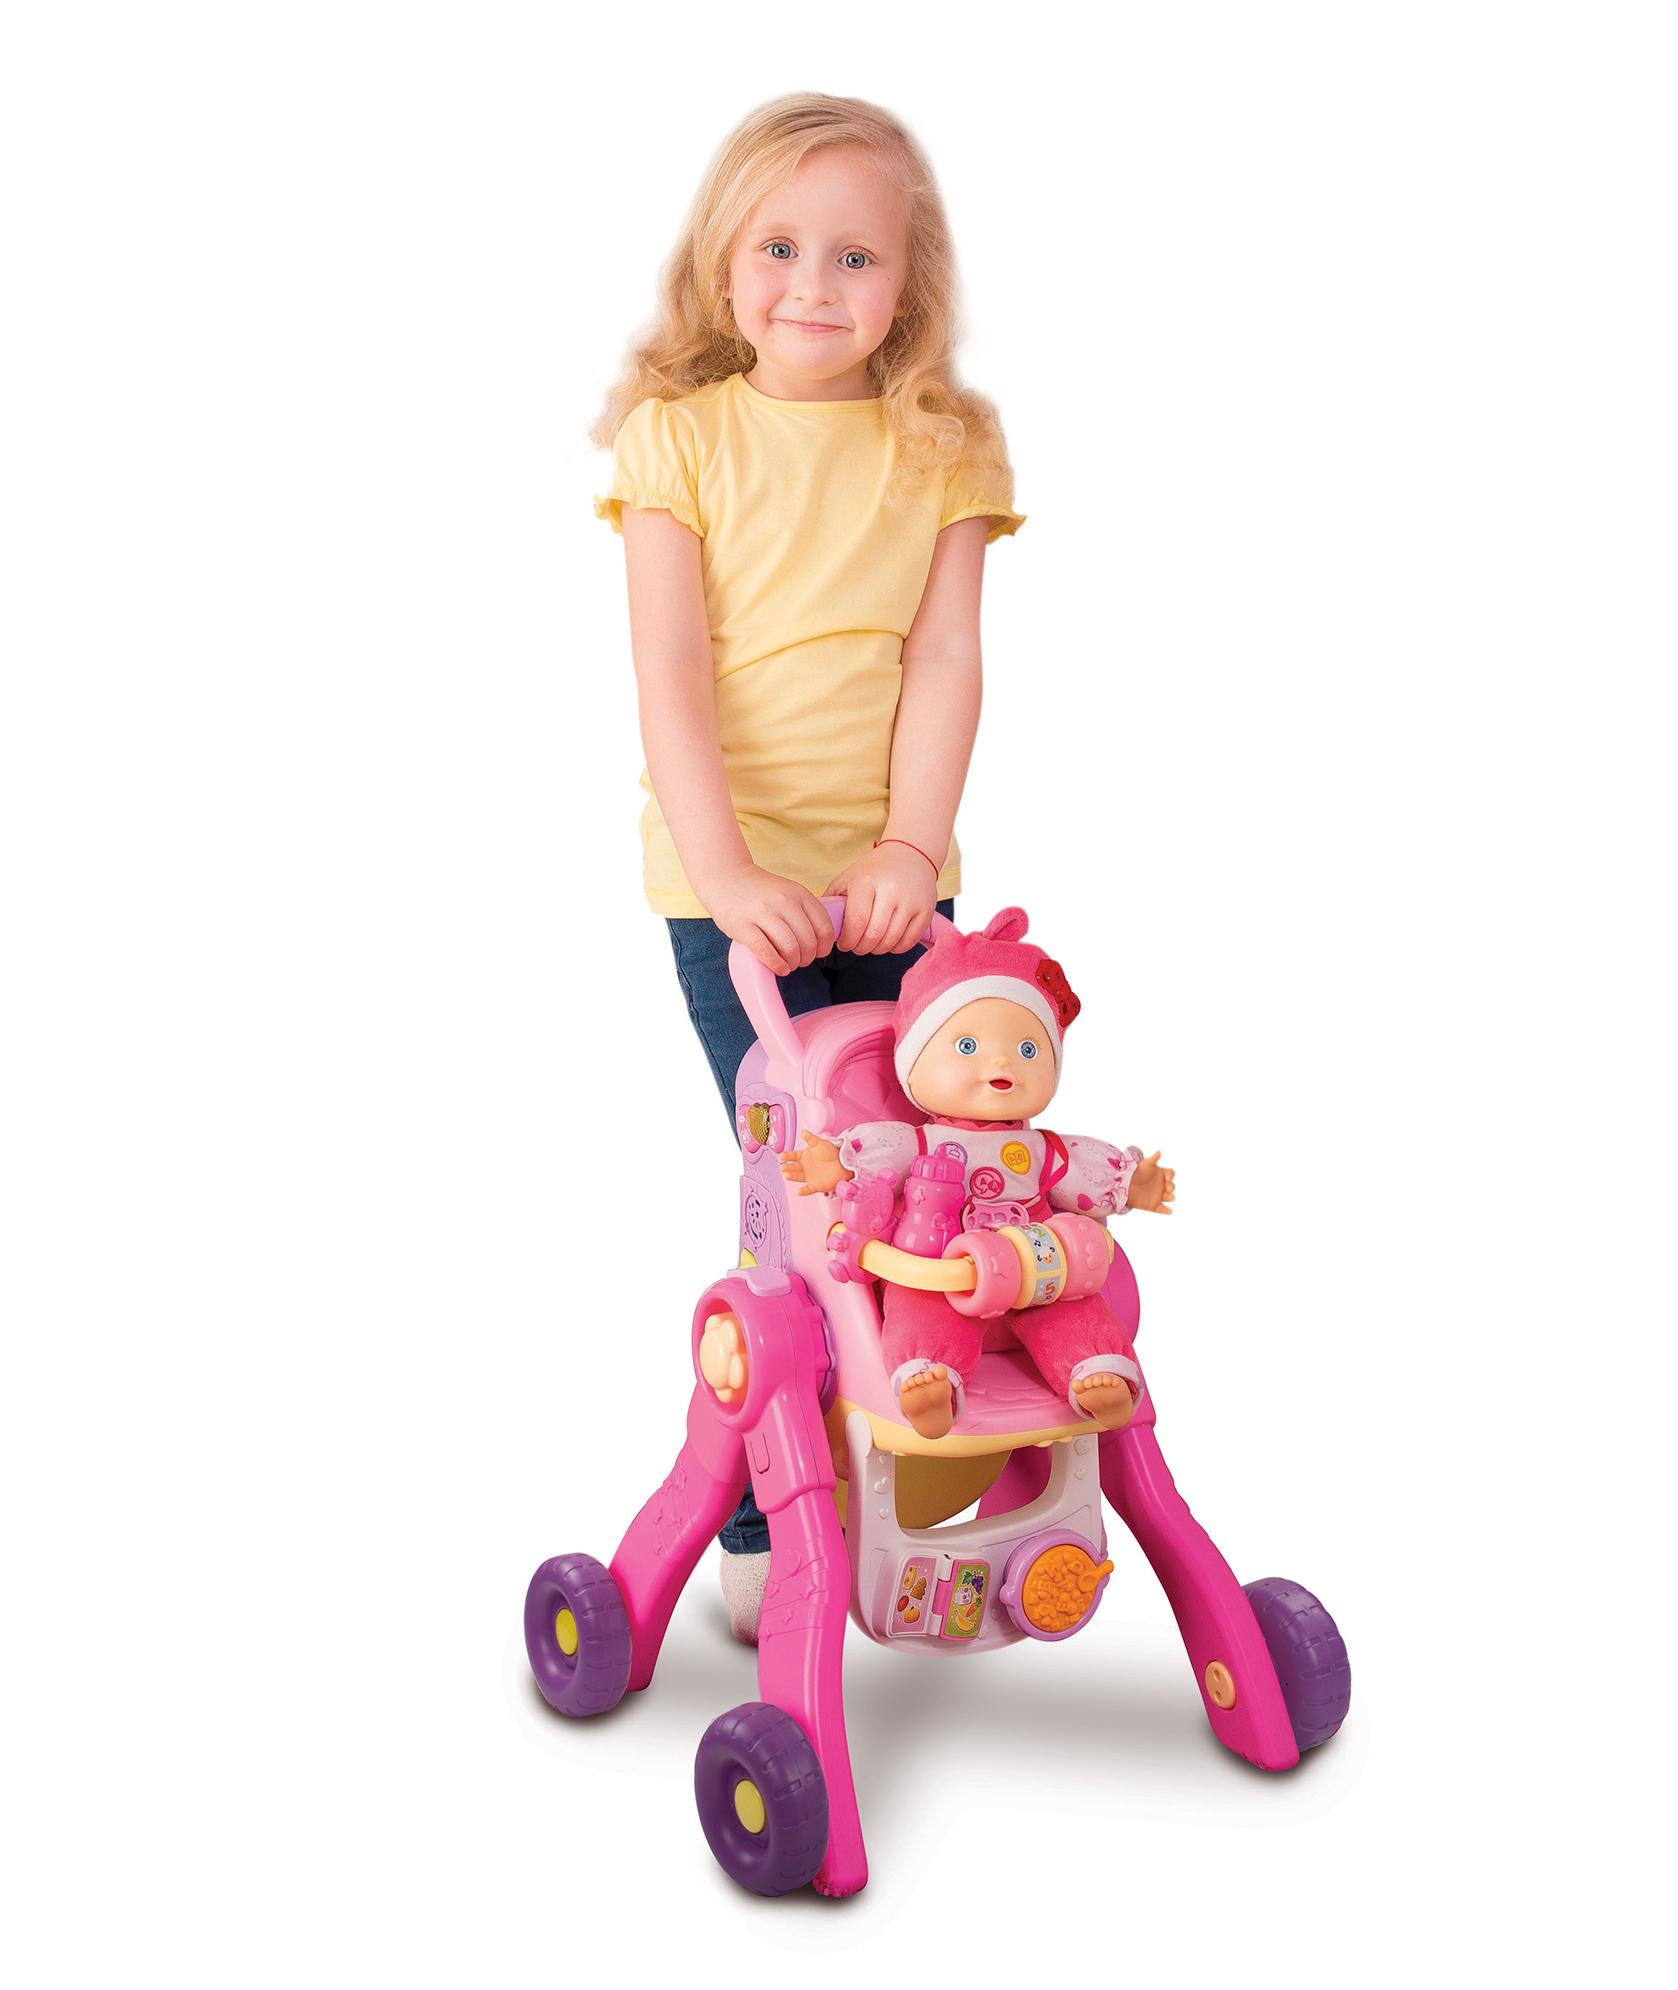 silla de paseo de juguete · Ampliar